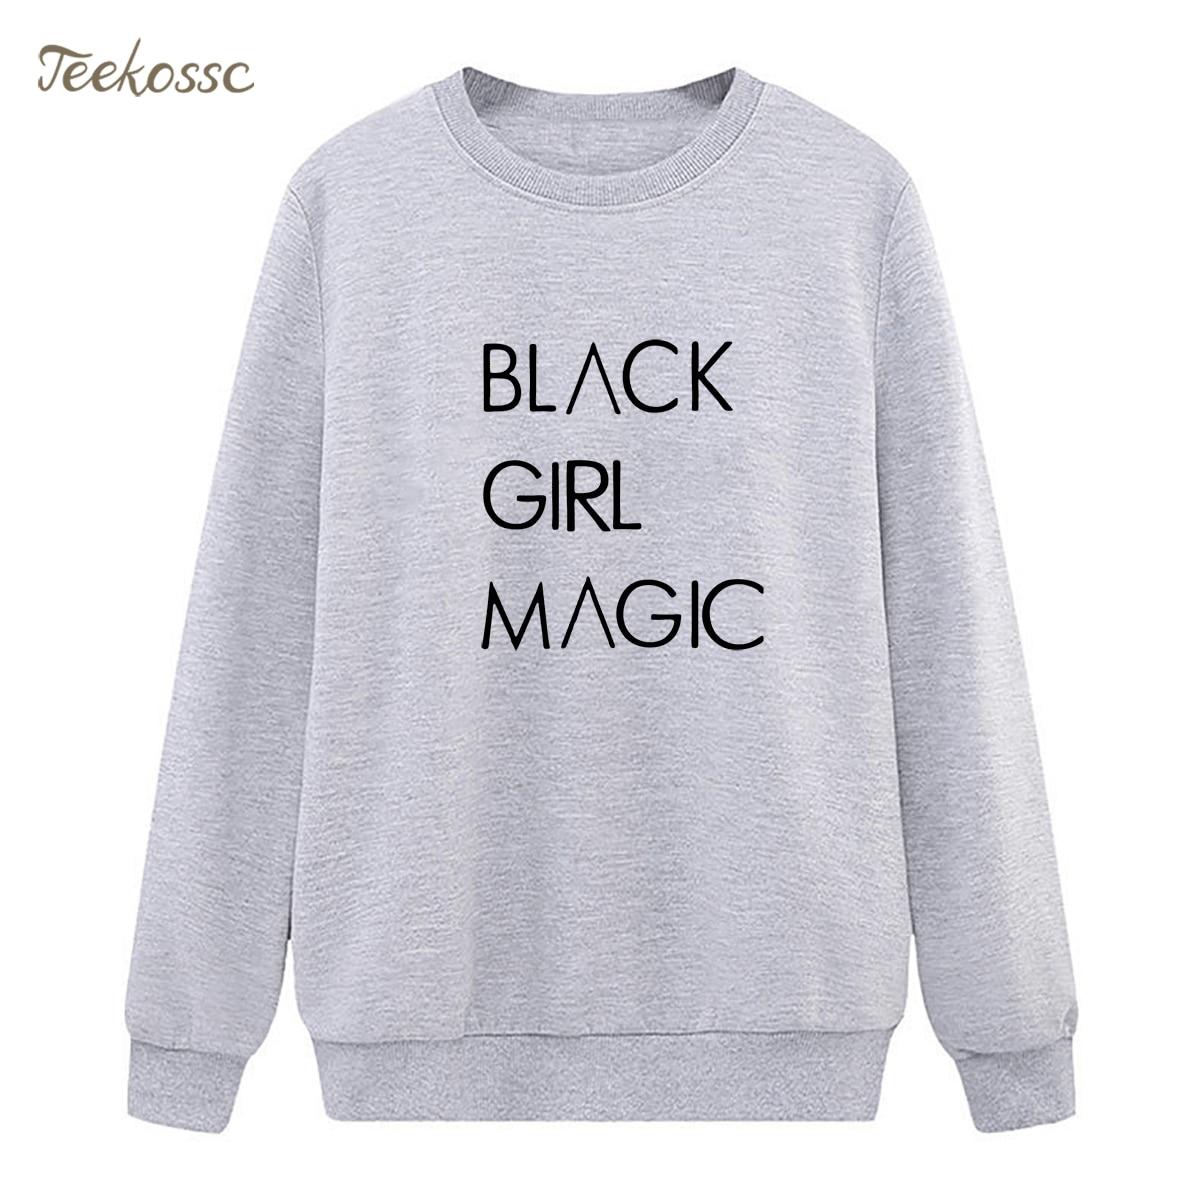 BLACK GIRL MAGIC Sweatshirt Casual Hoodie 2018 Winter Autumn Women Lasdies Pullover Fleece Warm Loose Streetwear Brand Clothing